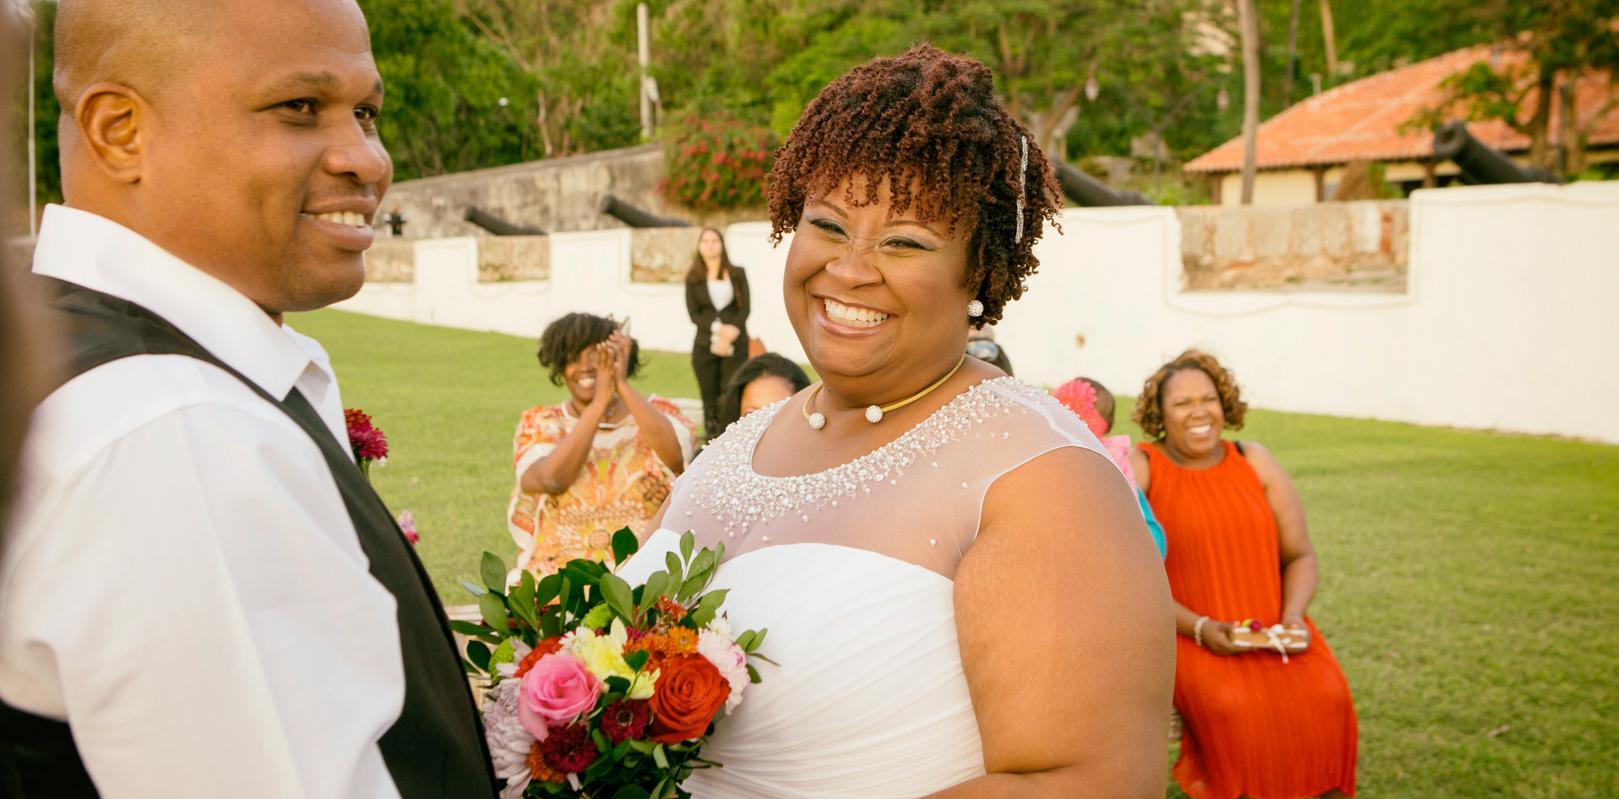 bodas-sin-clasificar-sin-tema-cuba-42101.jpg